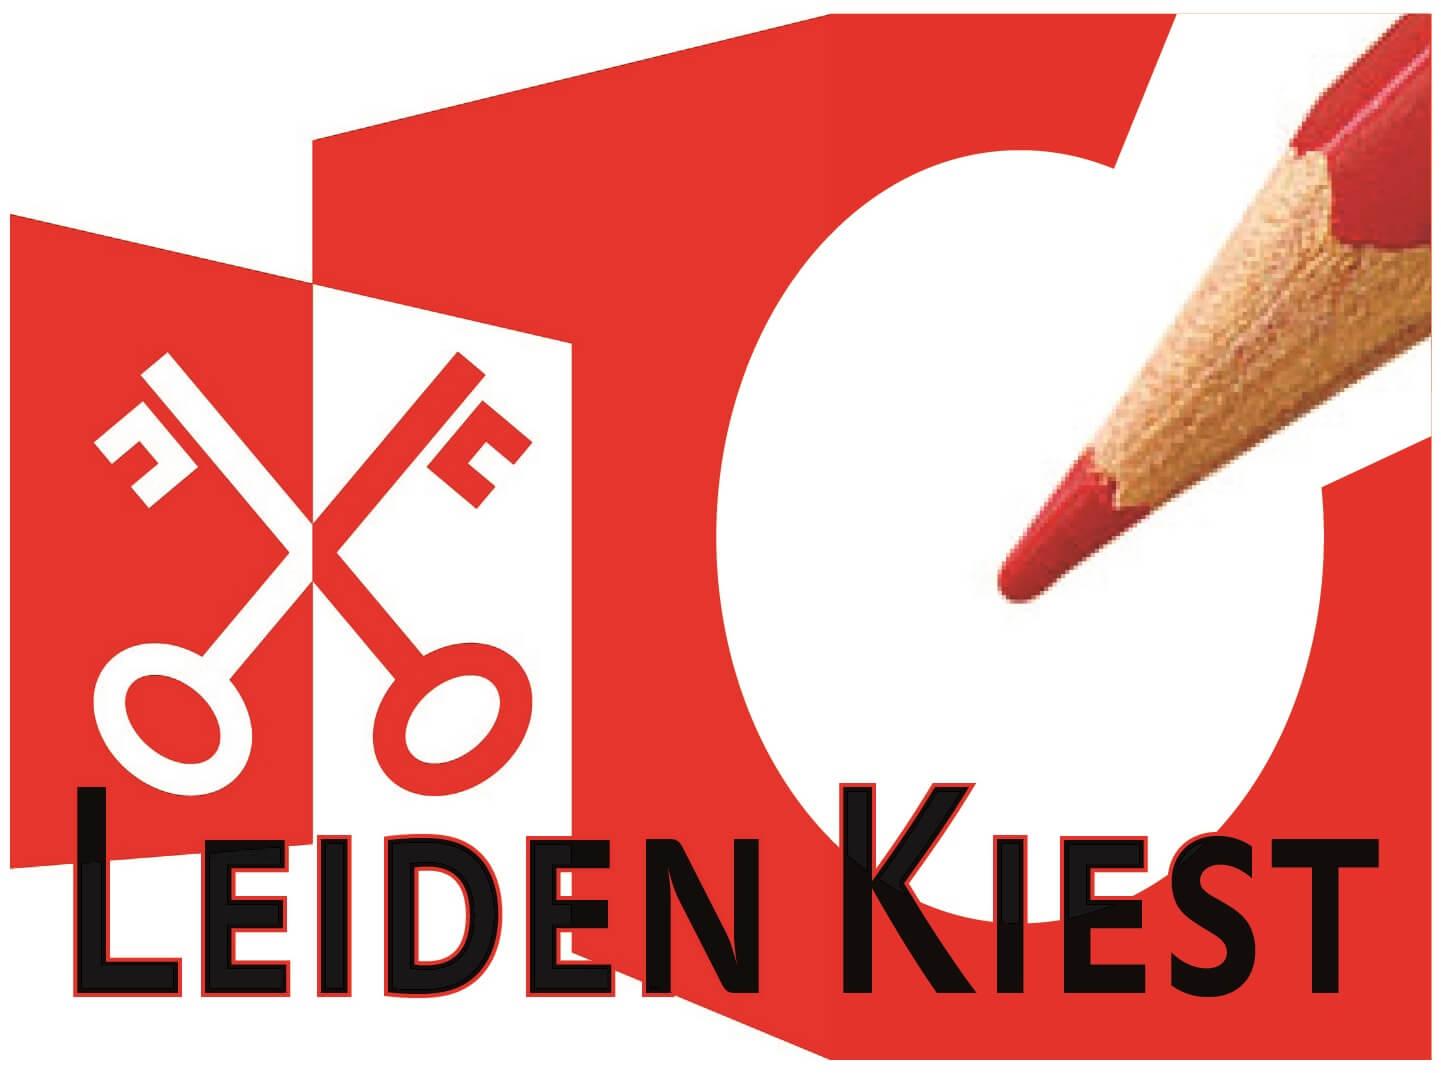 Leiden Kiest